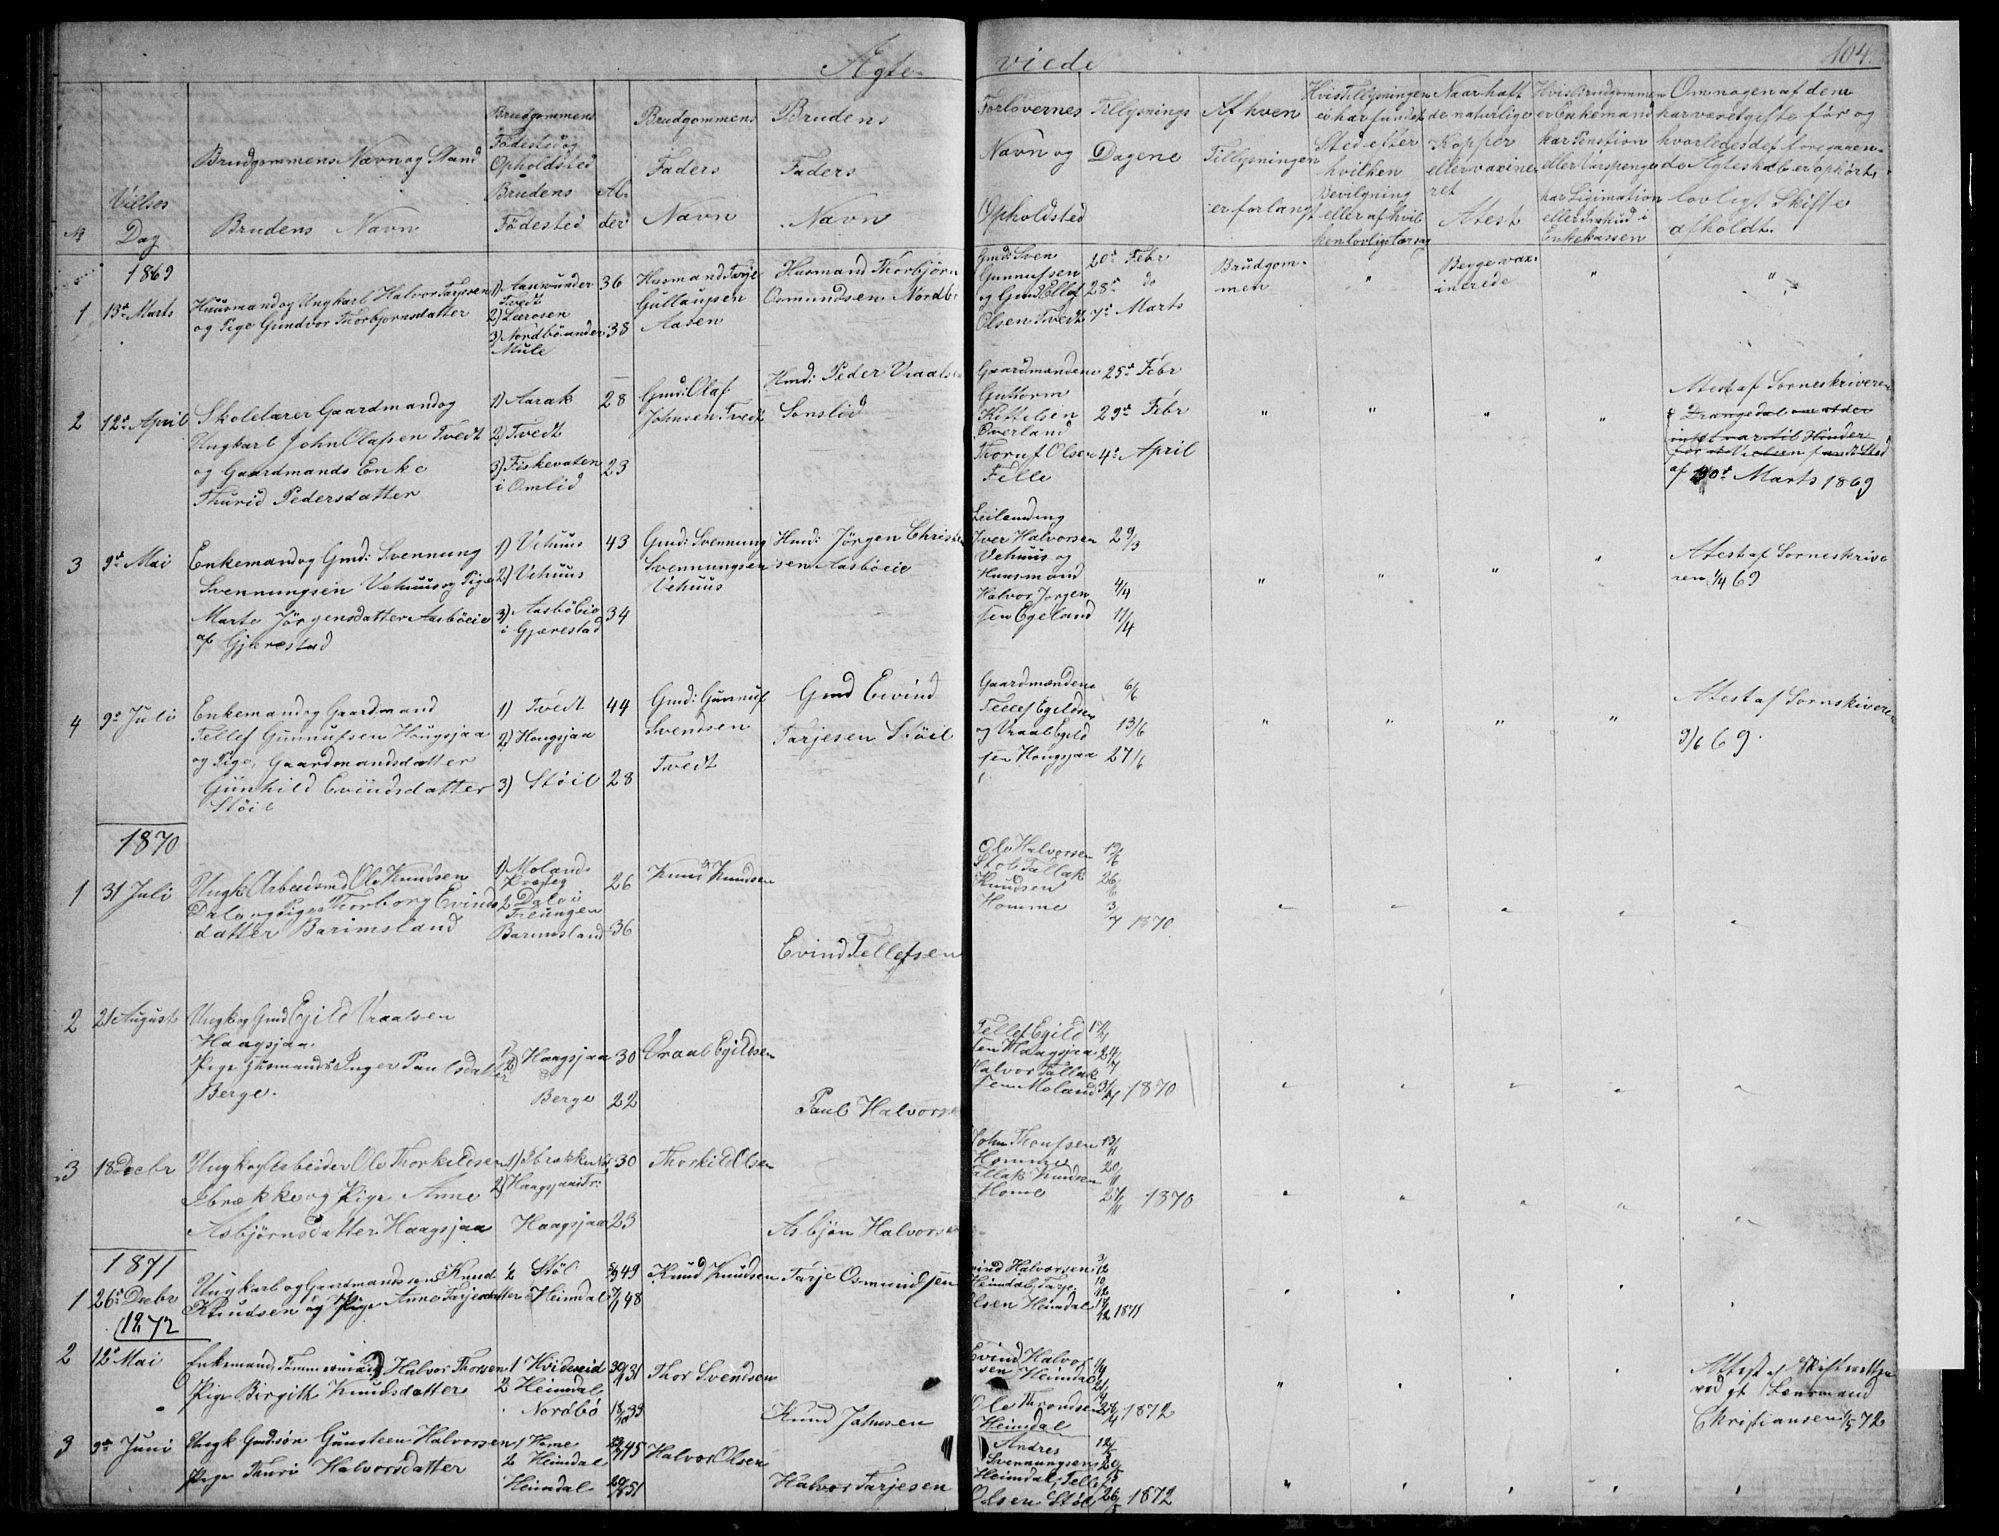 SAKO, Nissedal kirkebøker, G/Gb/L0002: Klokkerbok nr. II 2, 1863-1892, s. 104